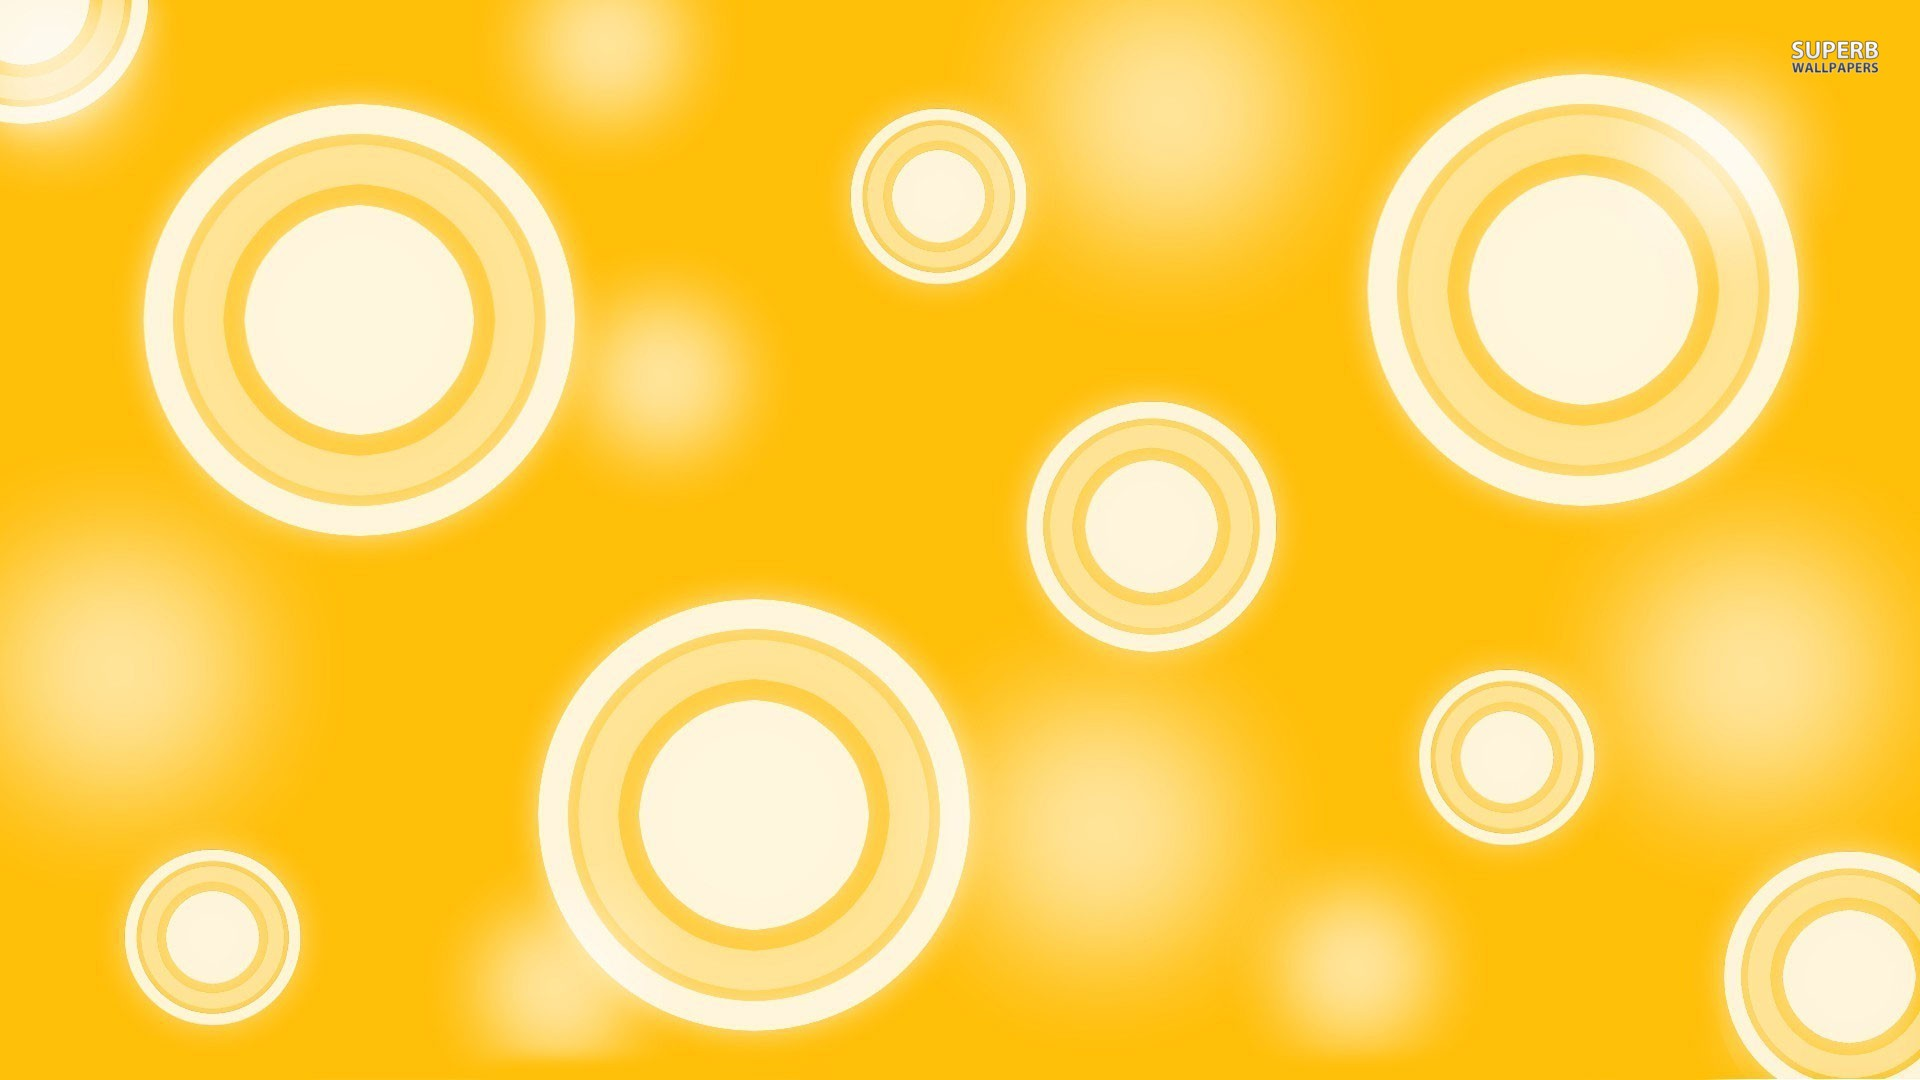 Retro yellow circles wallpaper 1920x1080